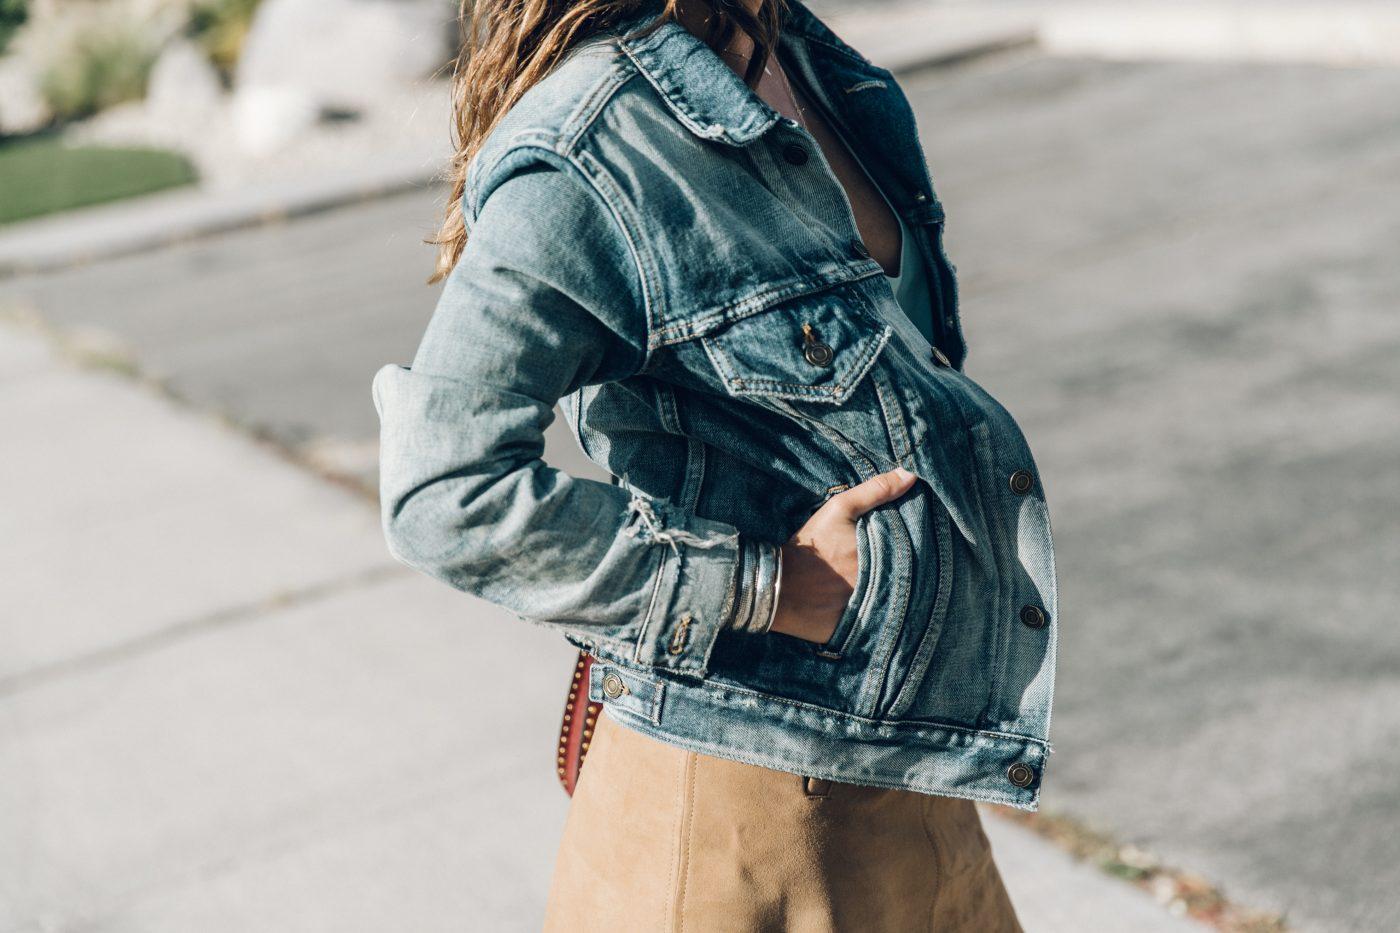 Denim_Jacket-Saint_Laurent-Chloe_Top-Suede_Skirt-Chloe_Hudson_Bag-Espadrilles-Coachella-Palm_Springs-Outfit-Collage_Vintage-83